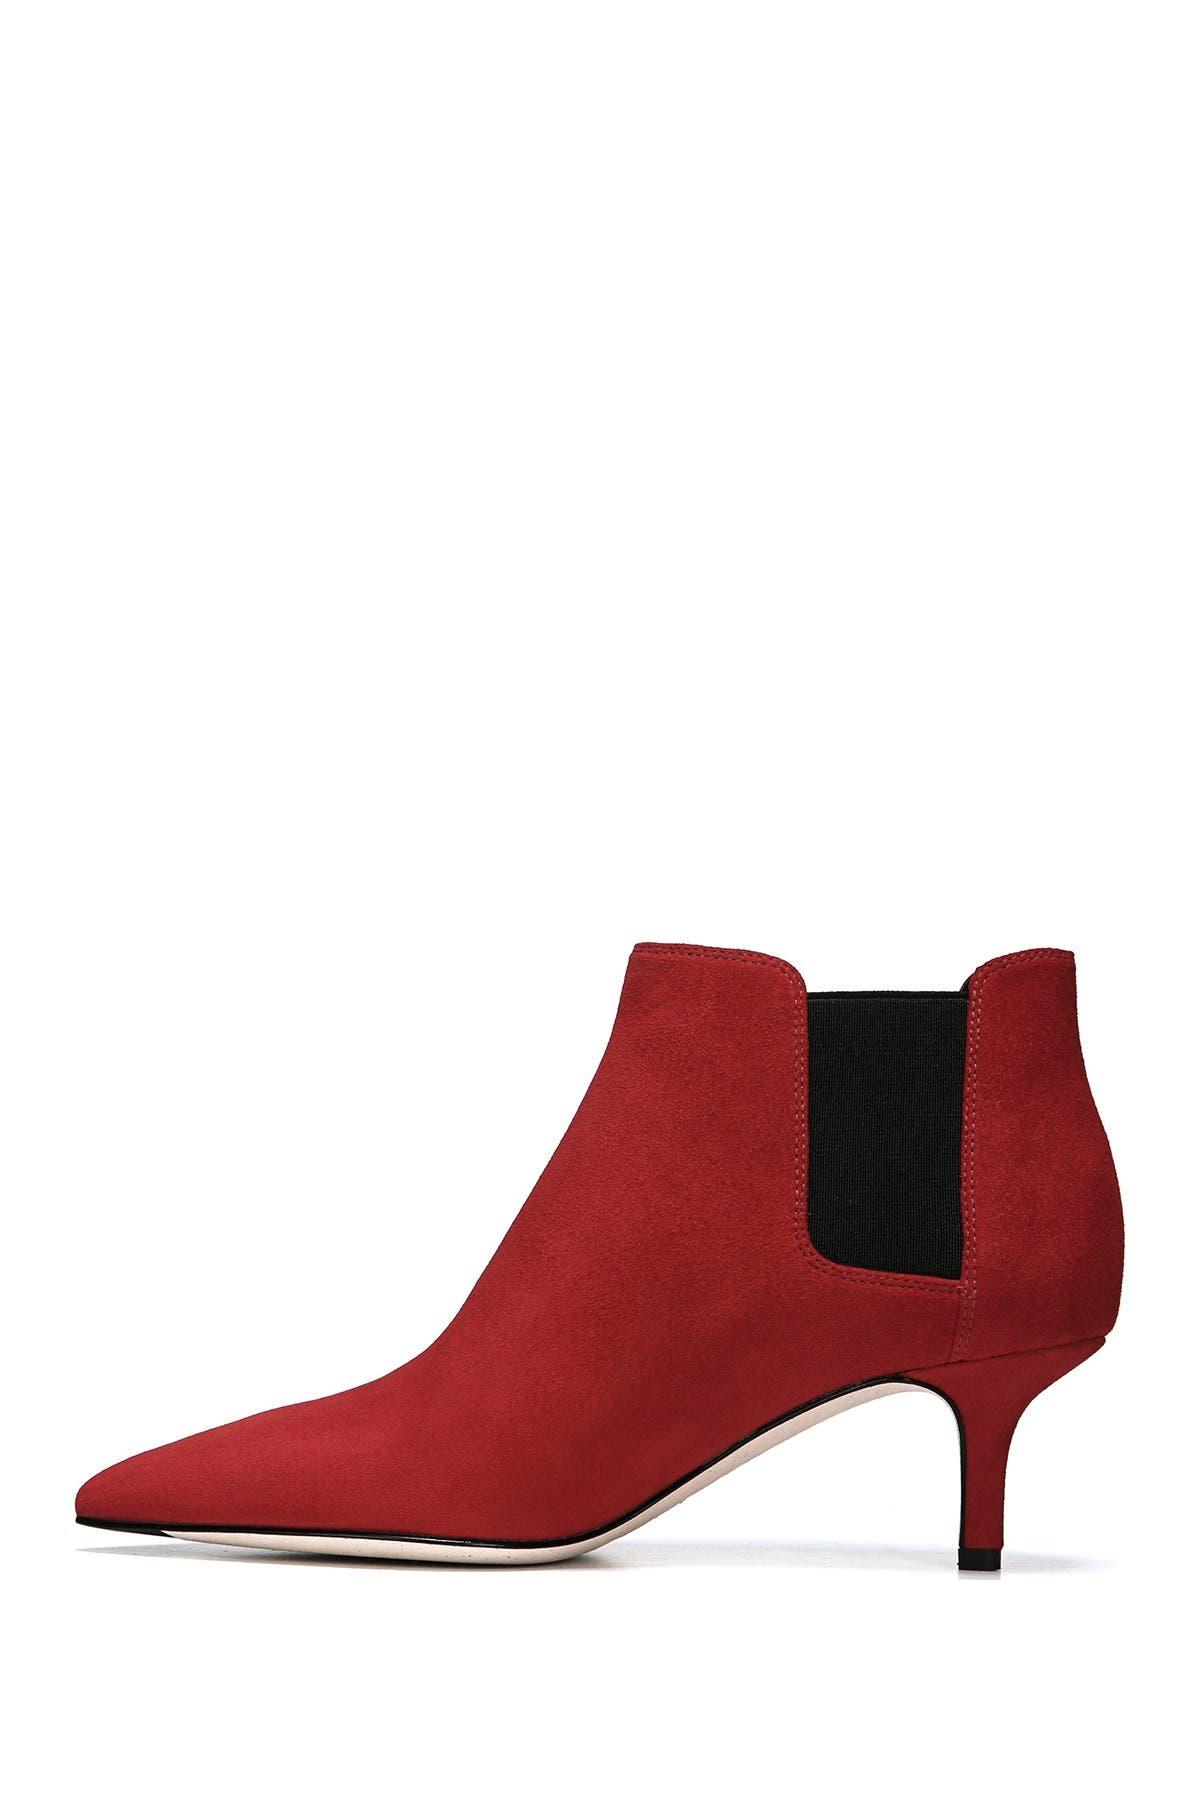 Maeve Suede Kitten Heel Ankle Boot